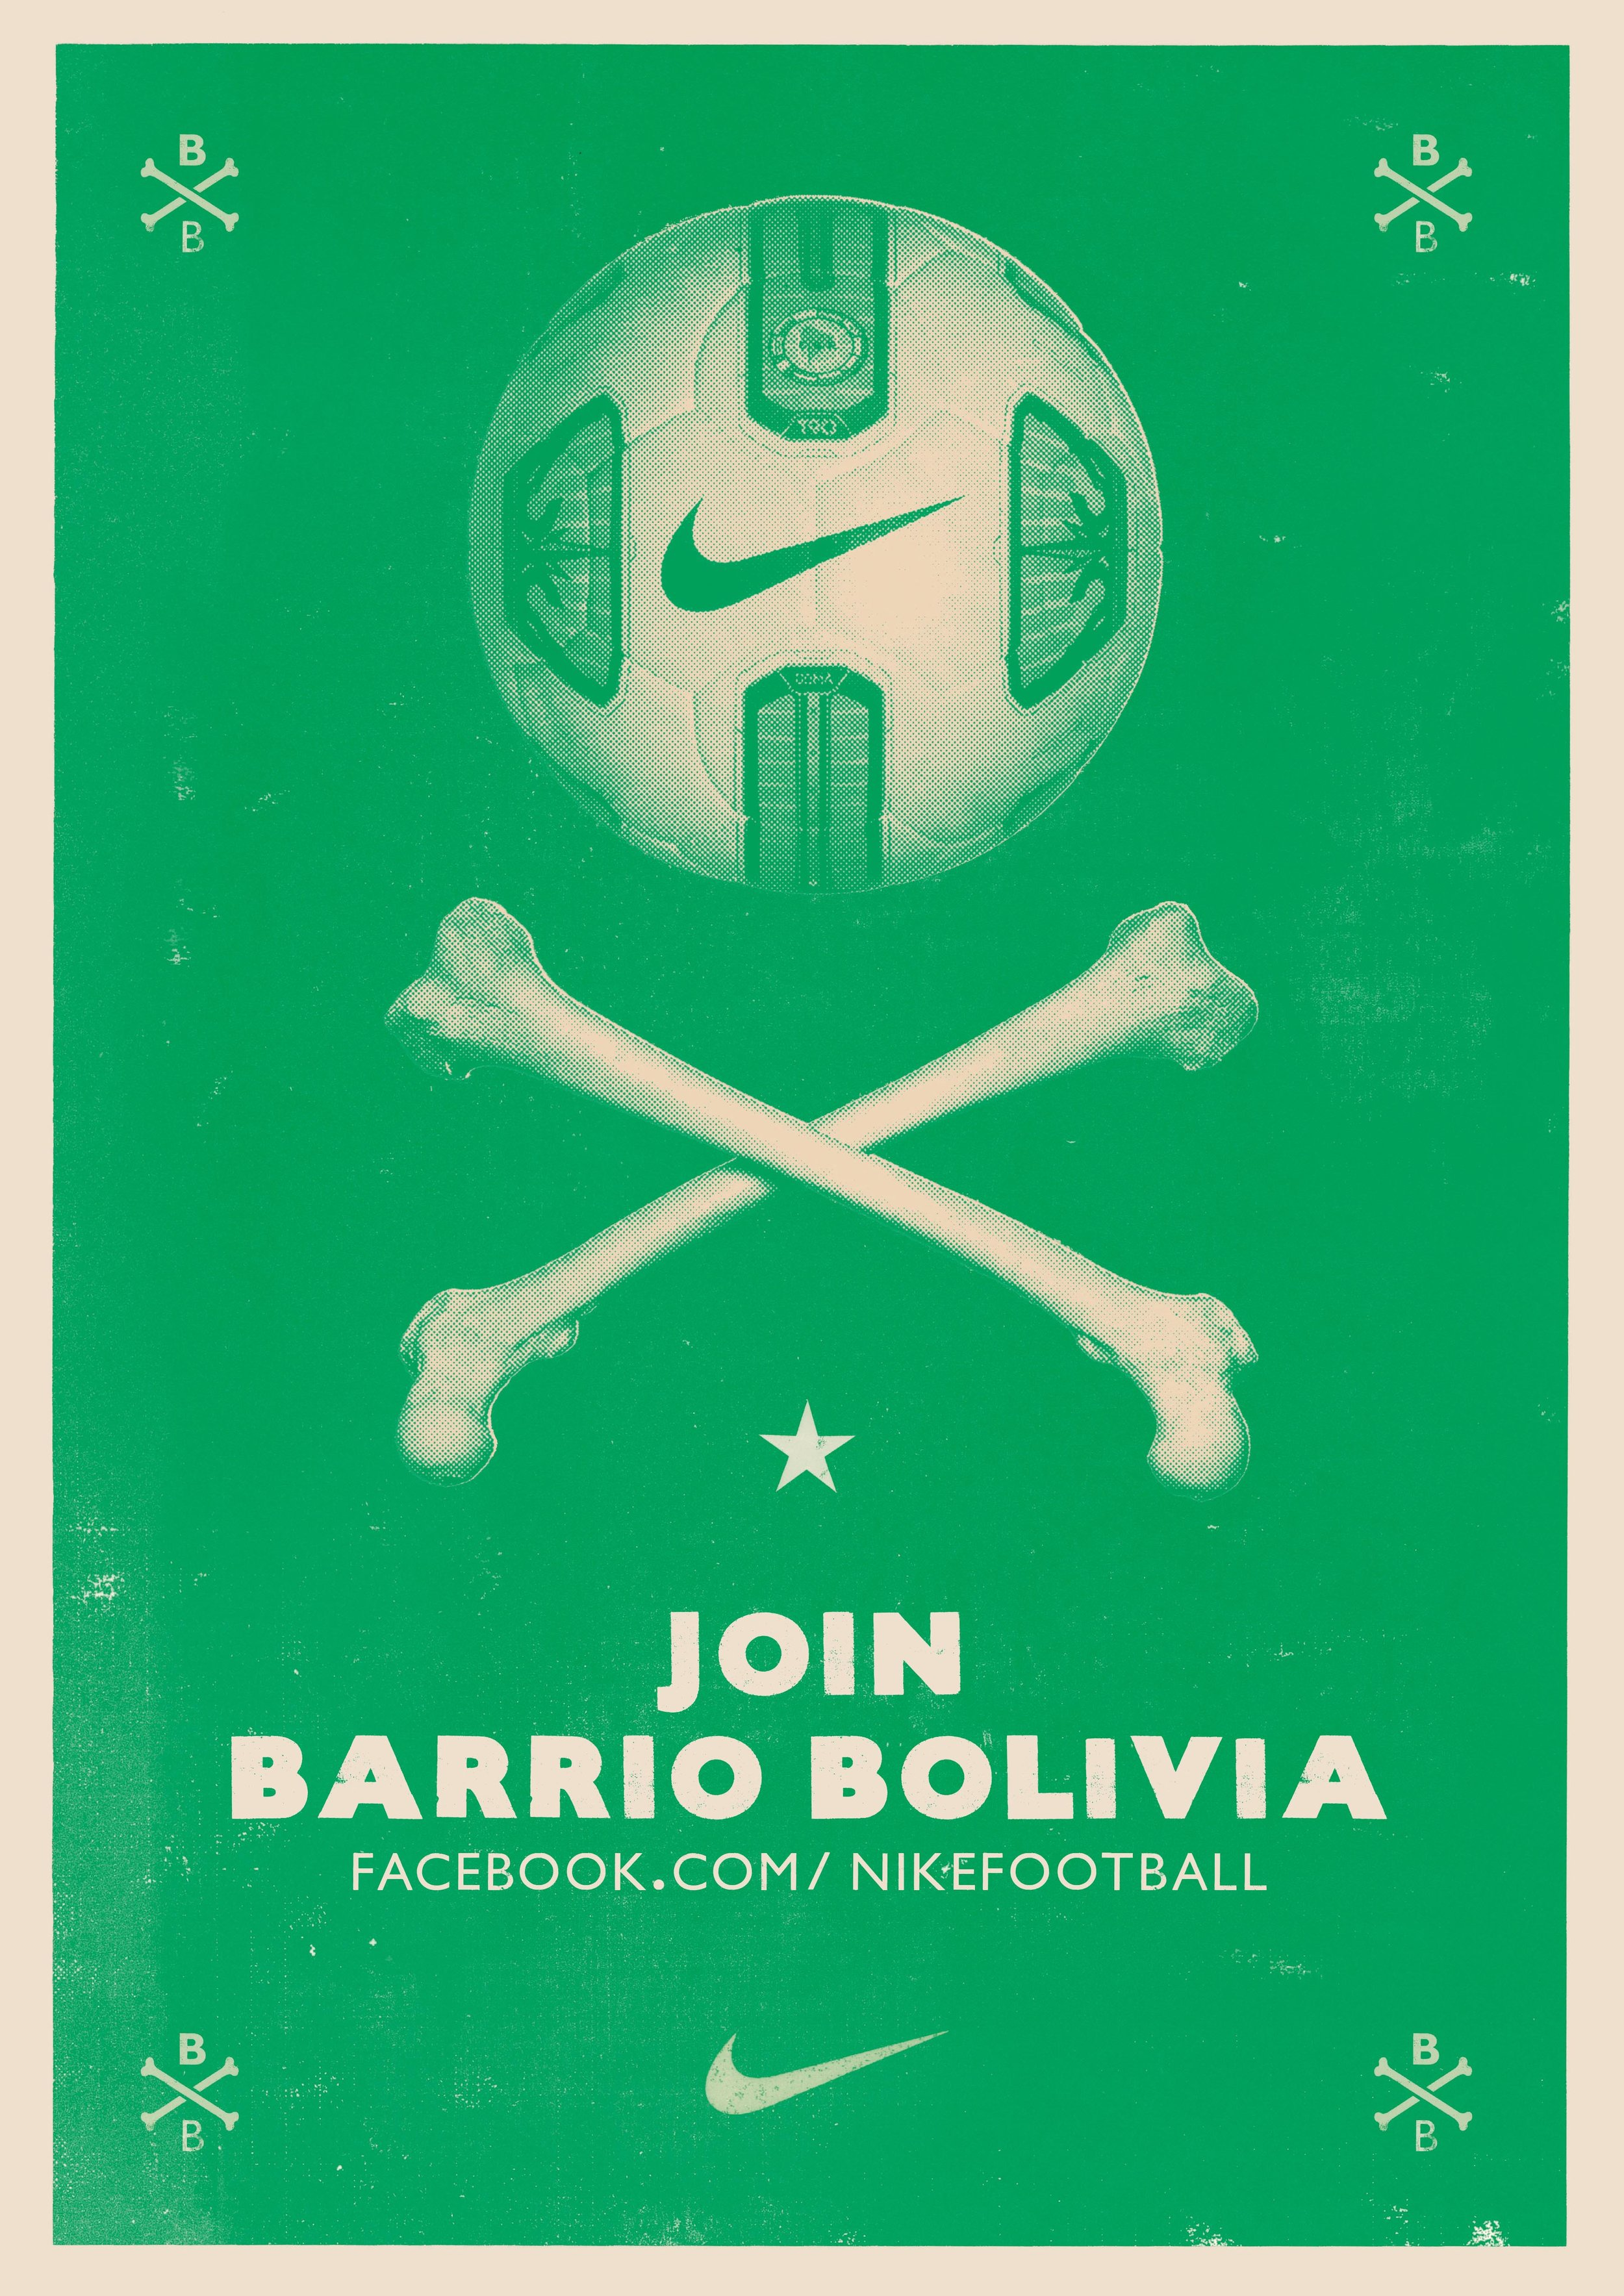 Copa_Join_Barrio_A3_Bolivia.jpg